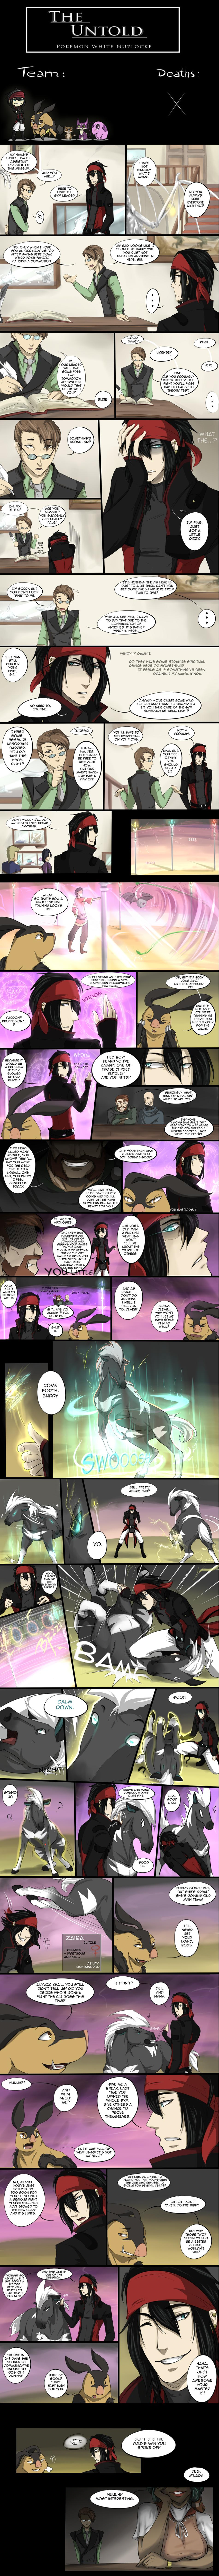 The Untold - part 28 by Antarija